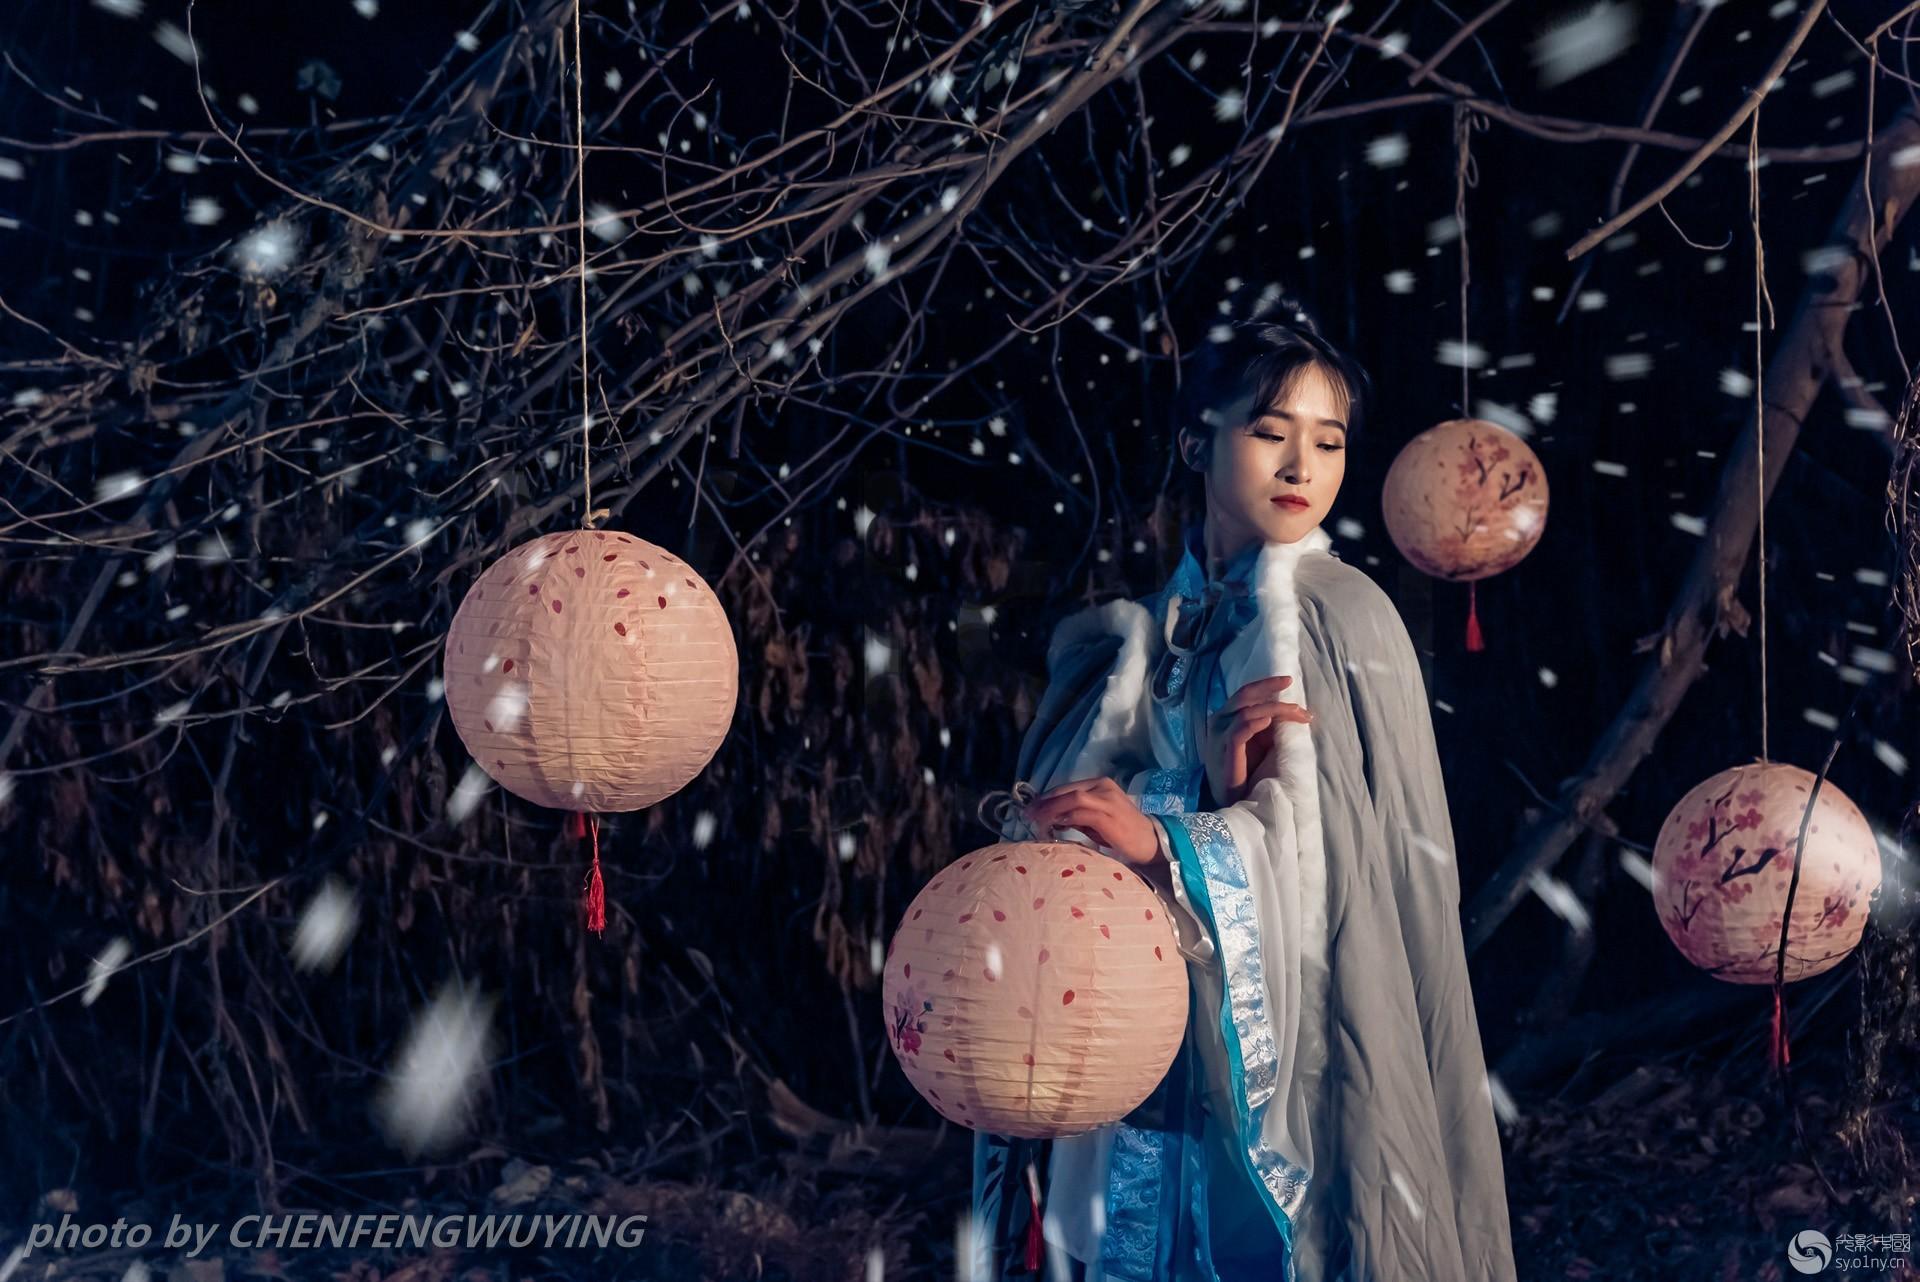 20191207_laodao_0143-1.jpg